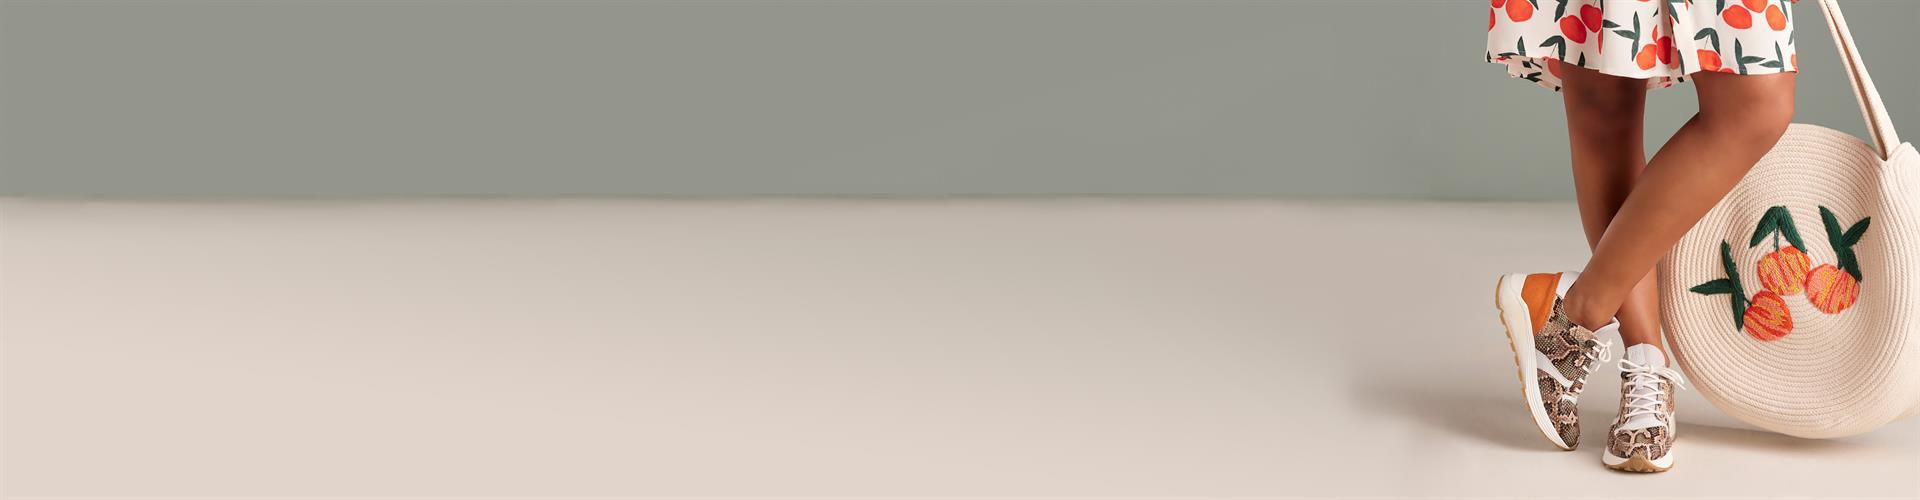 01-SchoenenPleinpagina-SliderTop-Desktop-3840x1000